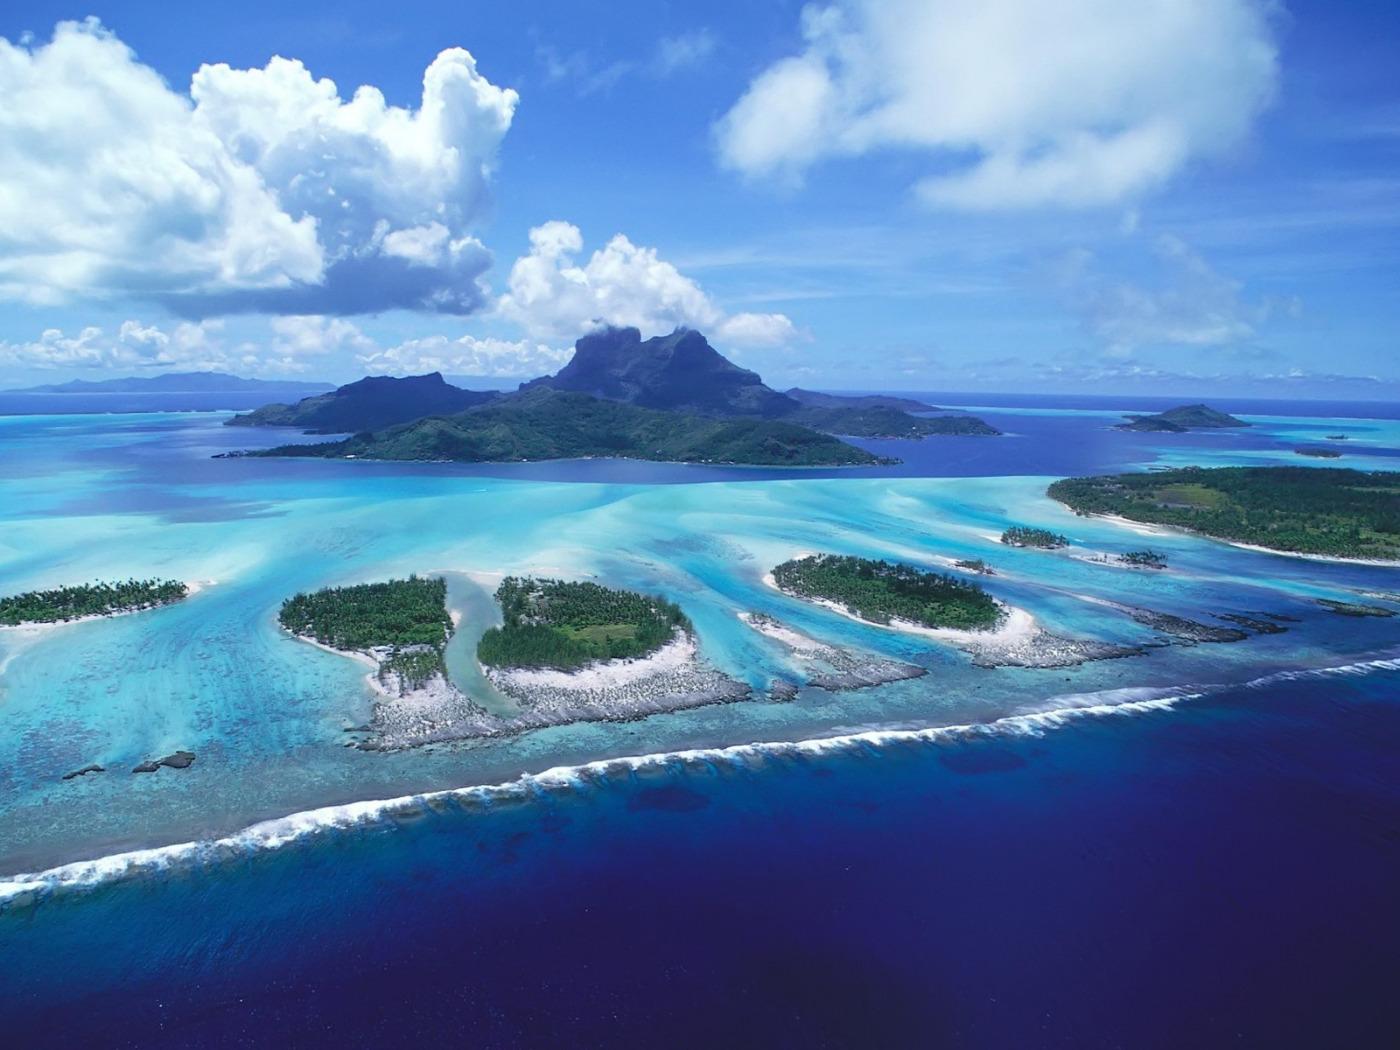 Фото островов на экран телефона